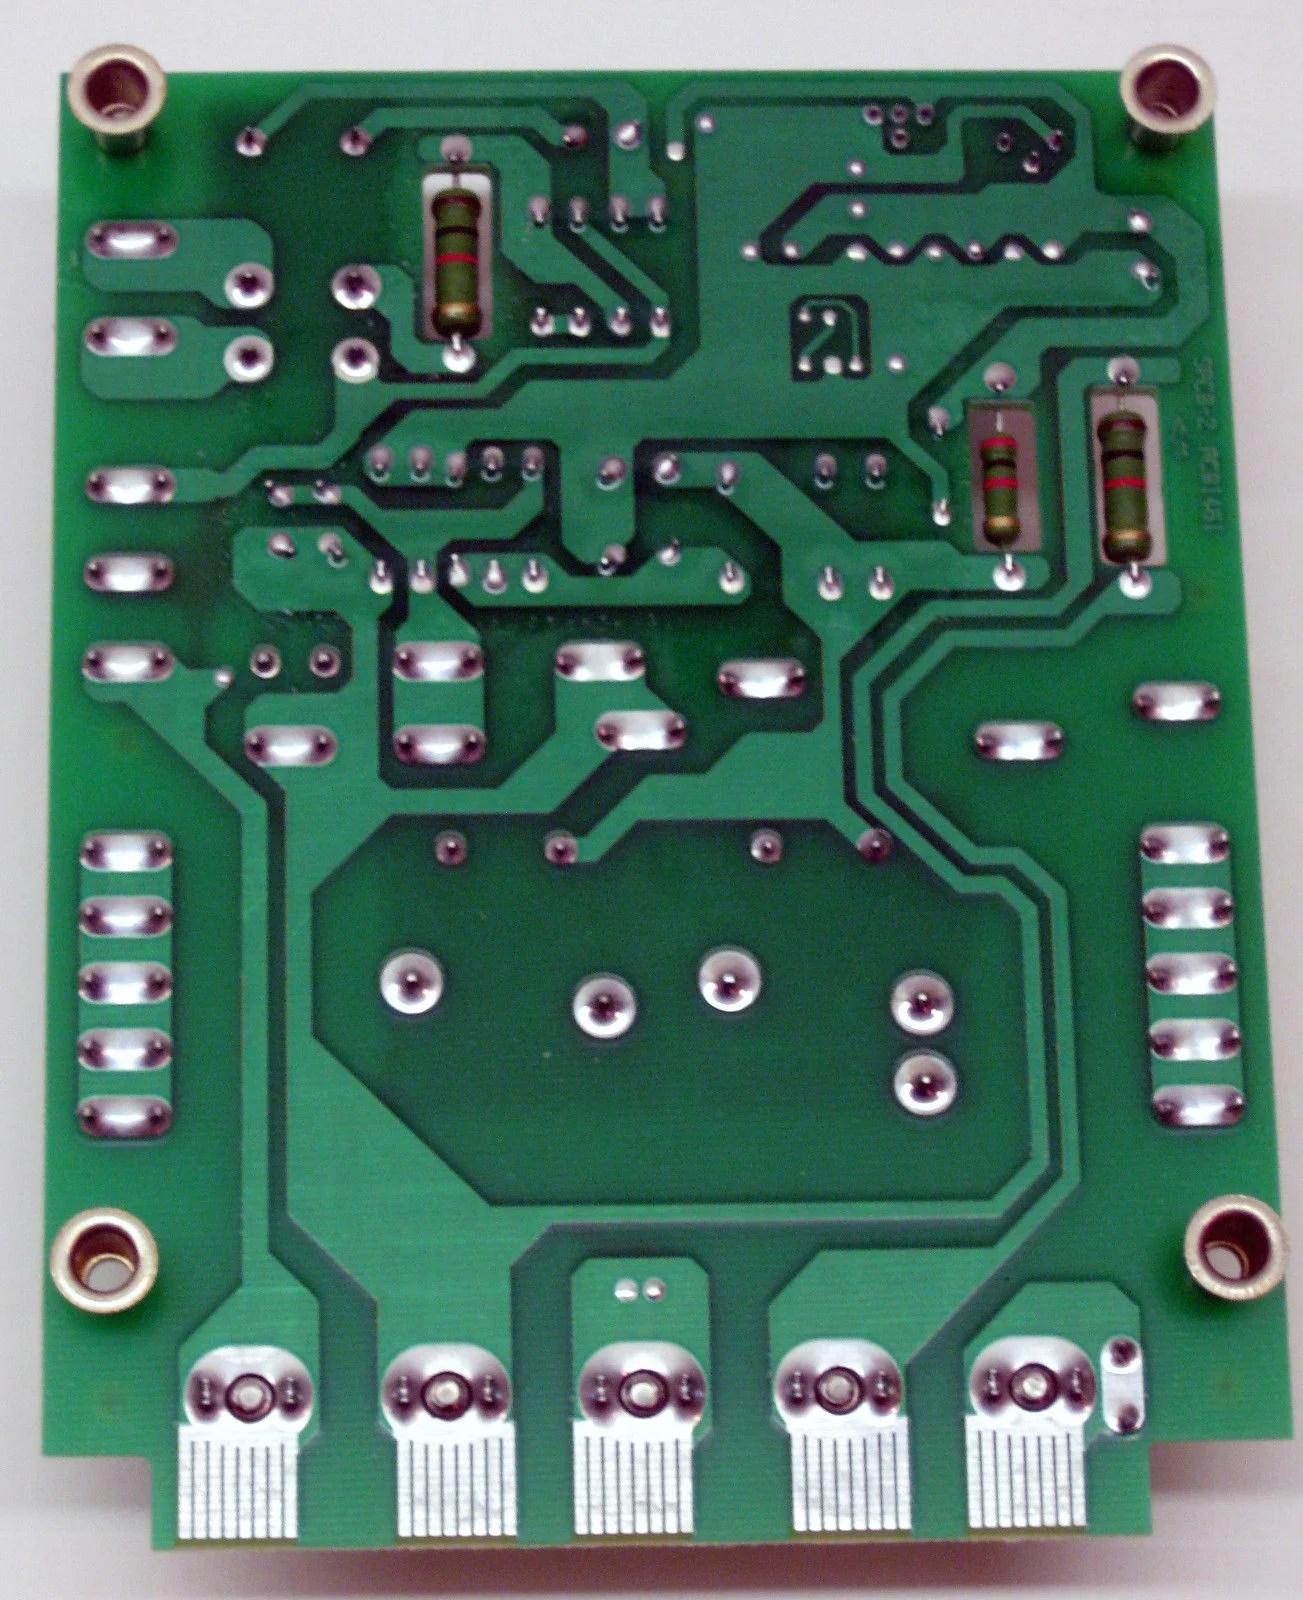 hight resolution of icm circuit board wiring diagram wiring diagrams konsult circuit board hh84aa017 wiring diagram